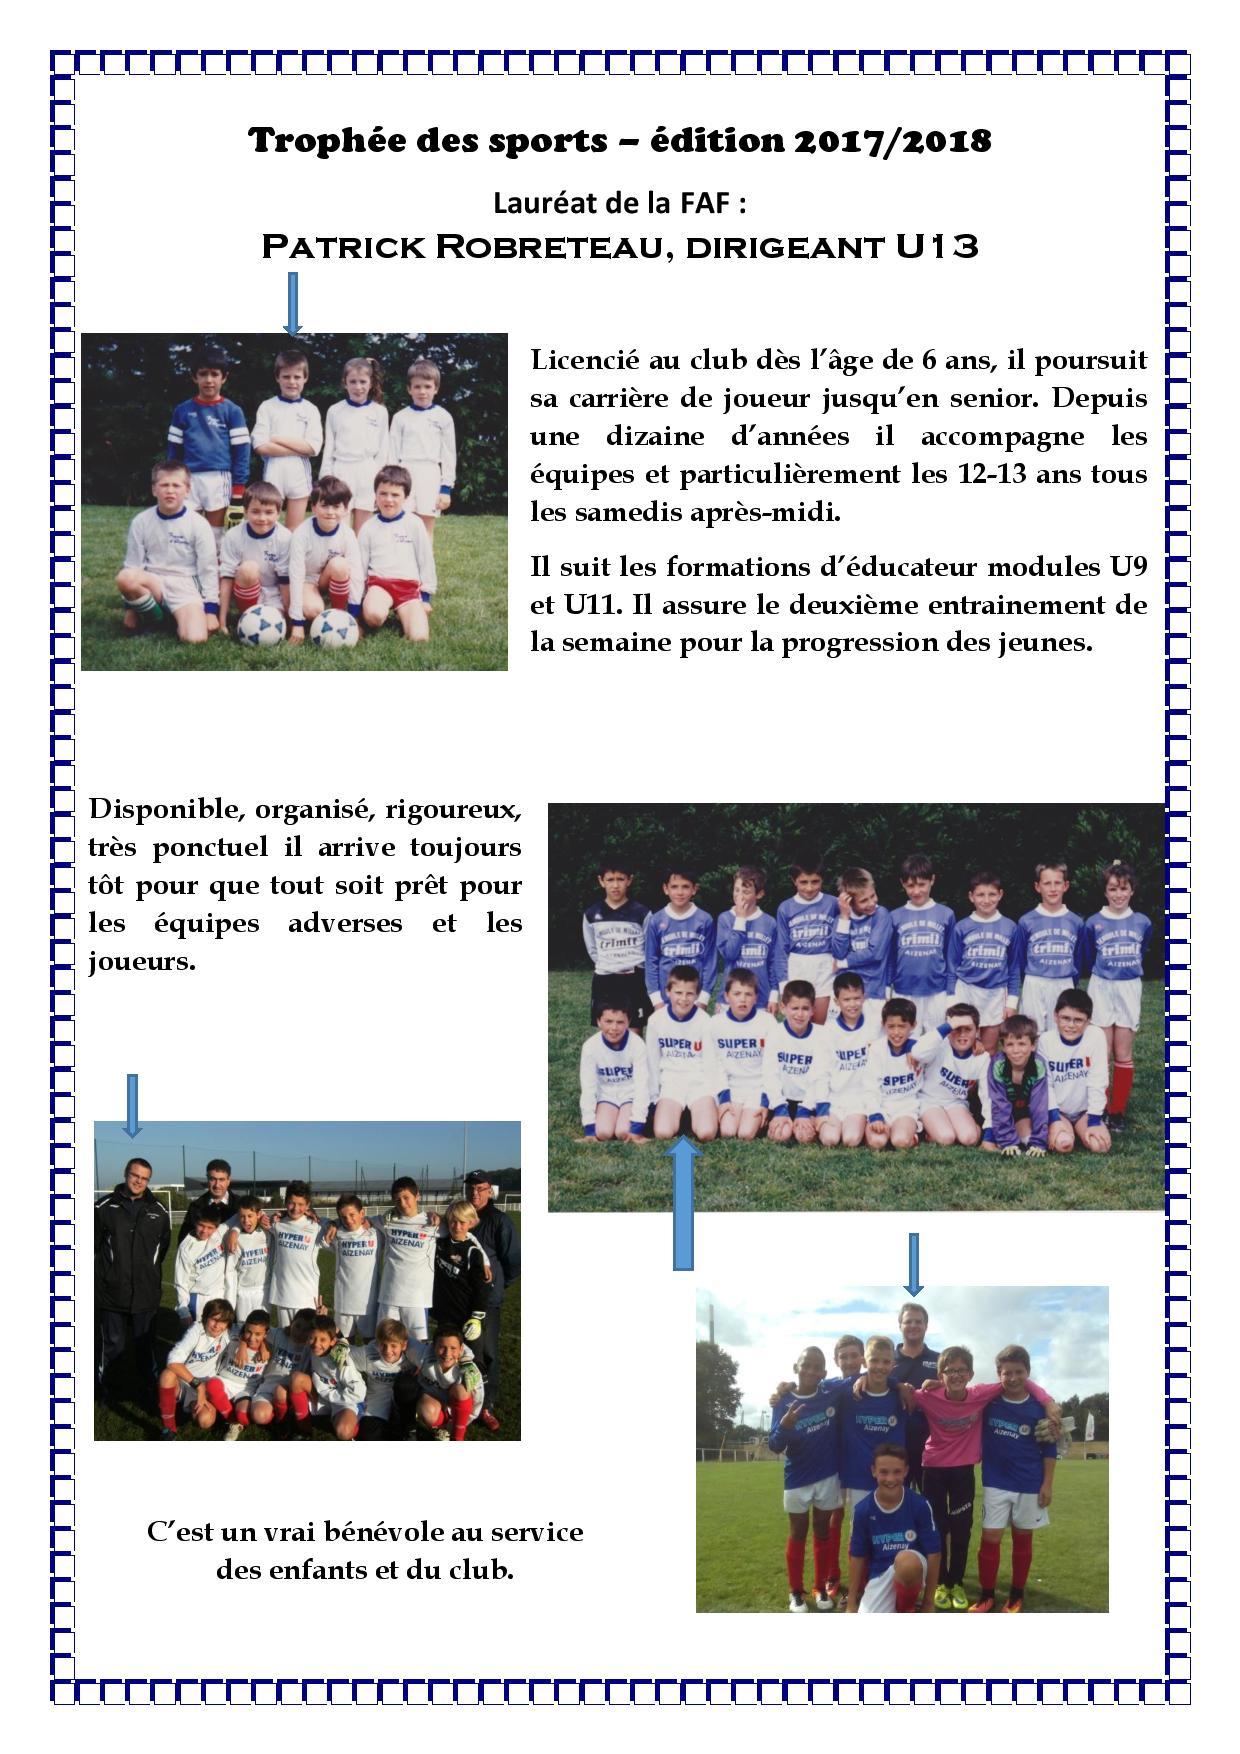 Trophée des sports 2018-page-001.jpg